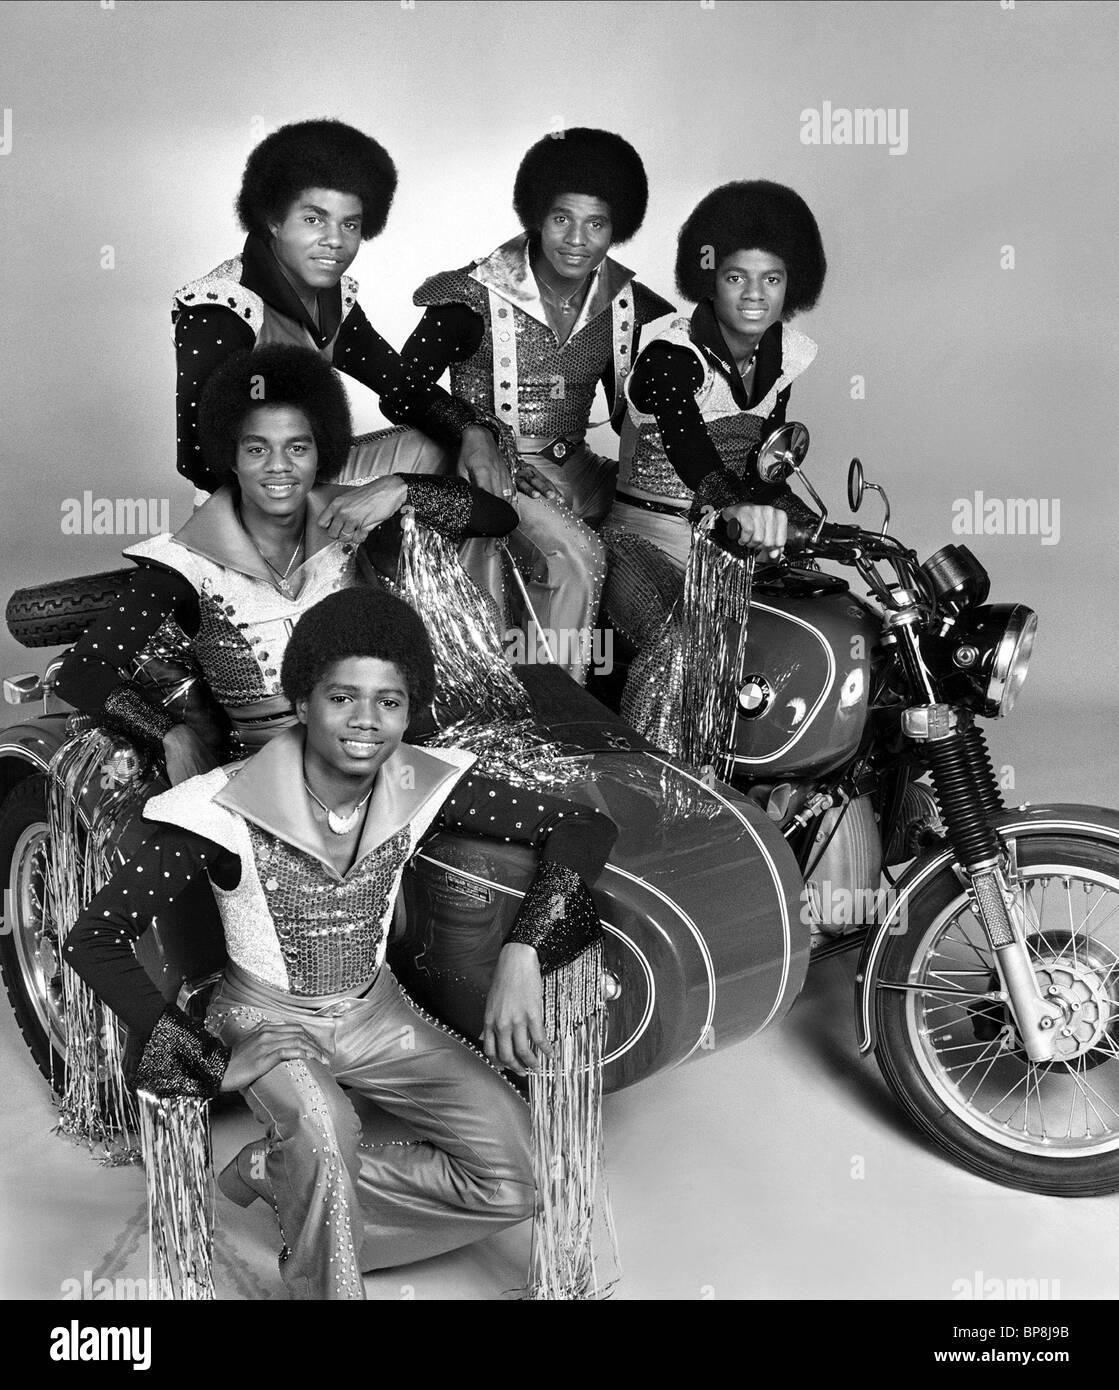 RANDY JACKSON, MARLON JACKSON, TITO JACKSON, JACKIE JACKSON, MICHAEL JACKSON, THE JACKSONS, 1977 - Stock Image